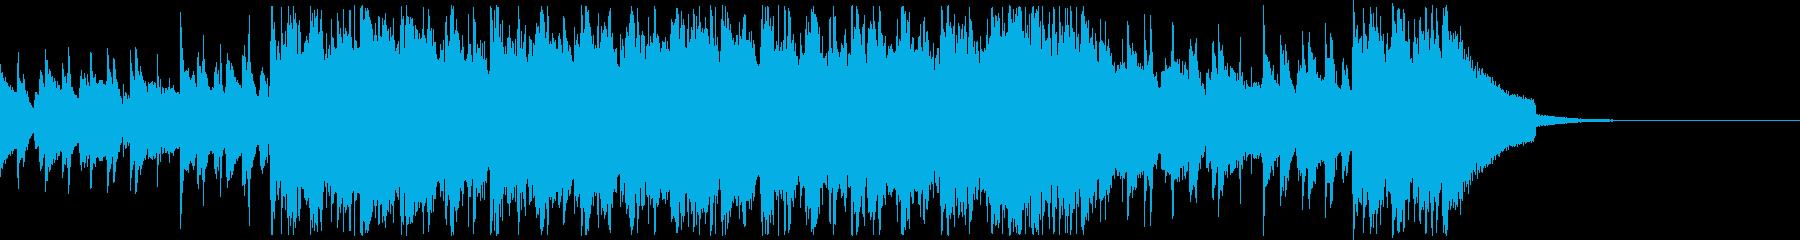 CM・陽気な沖縄の朝の再生済みの波形